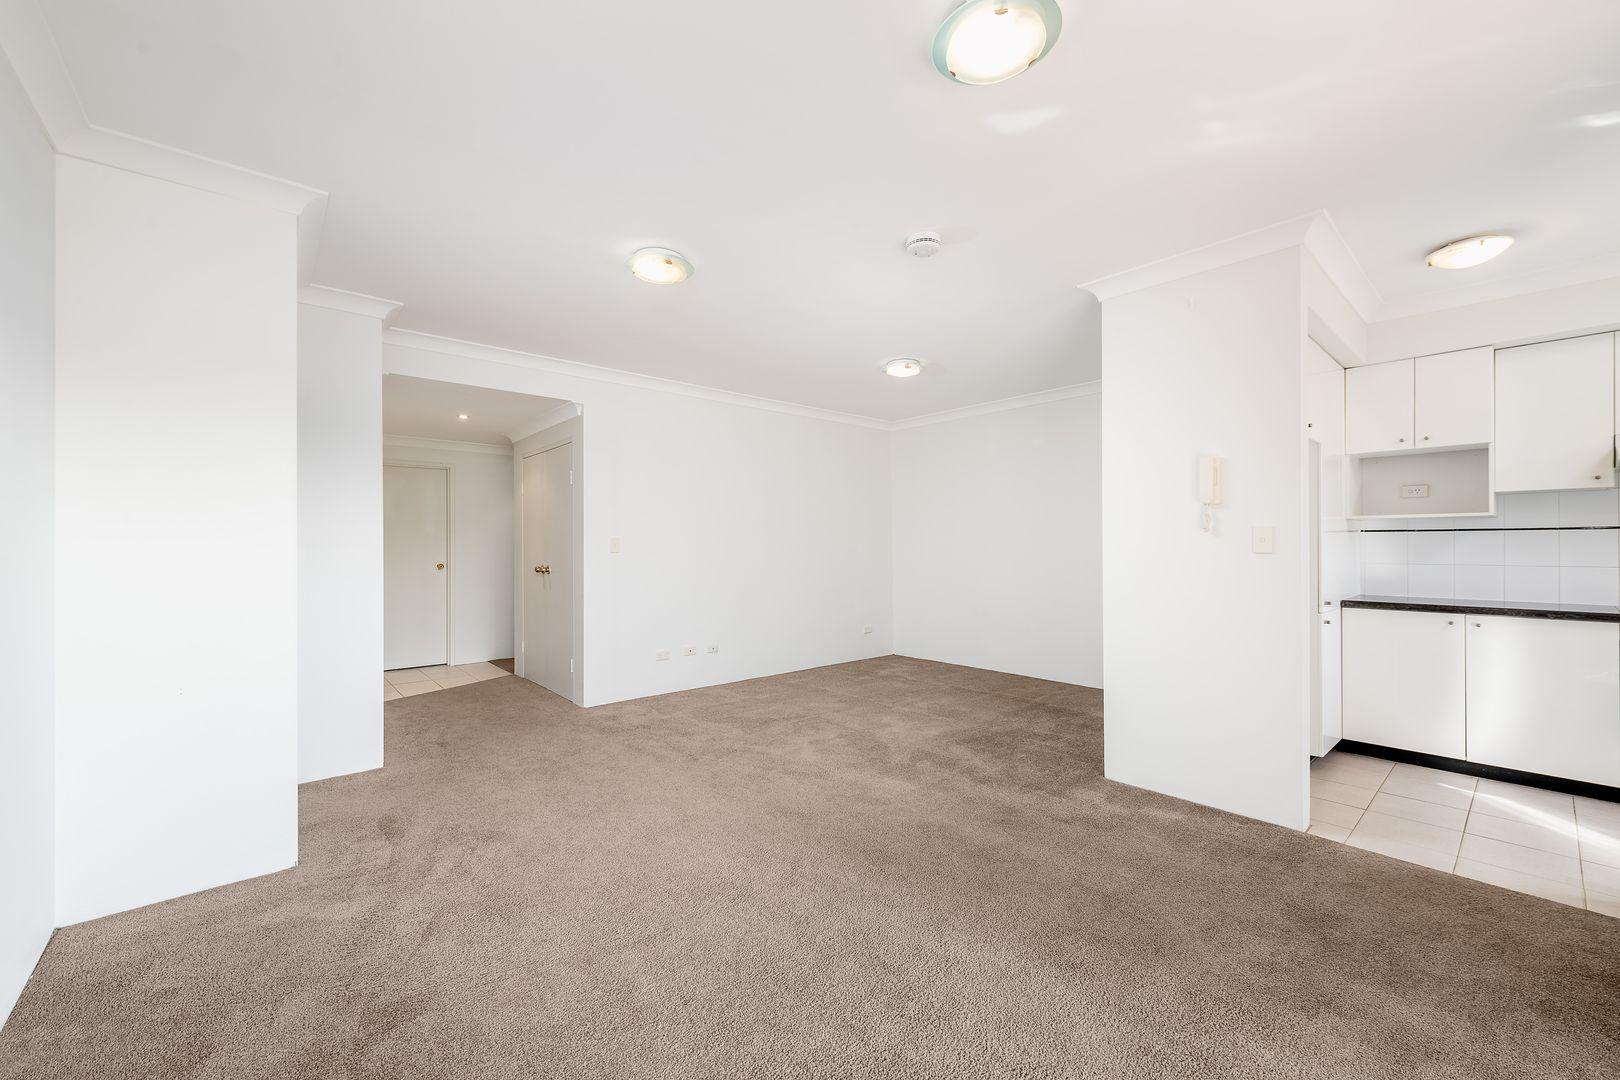 58/252 Willoughby  Road, Naremburn NSW 2065, Image 2